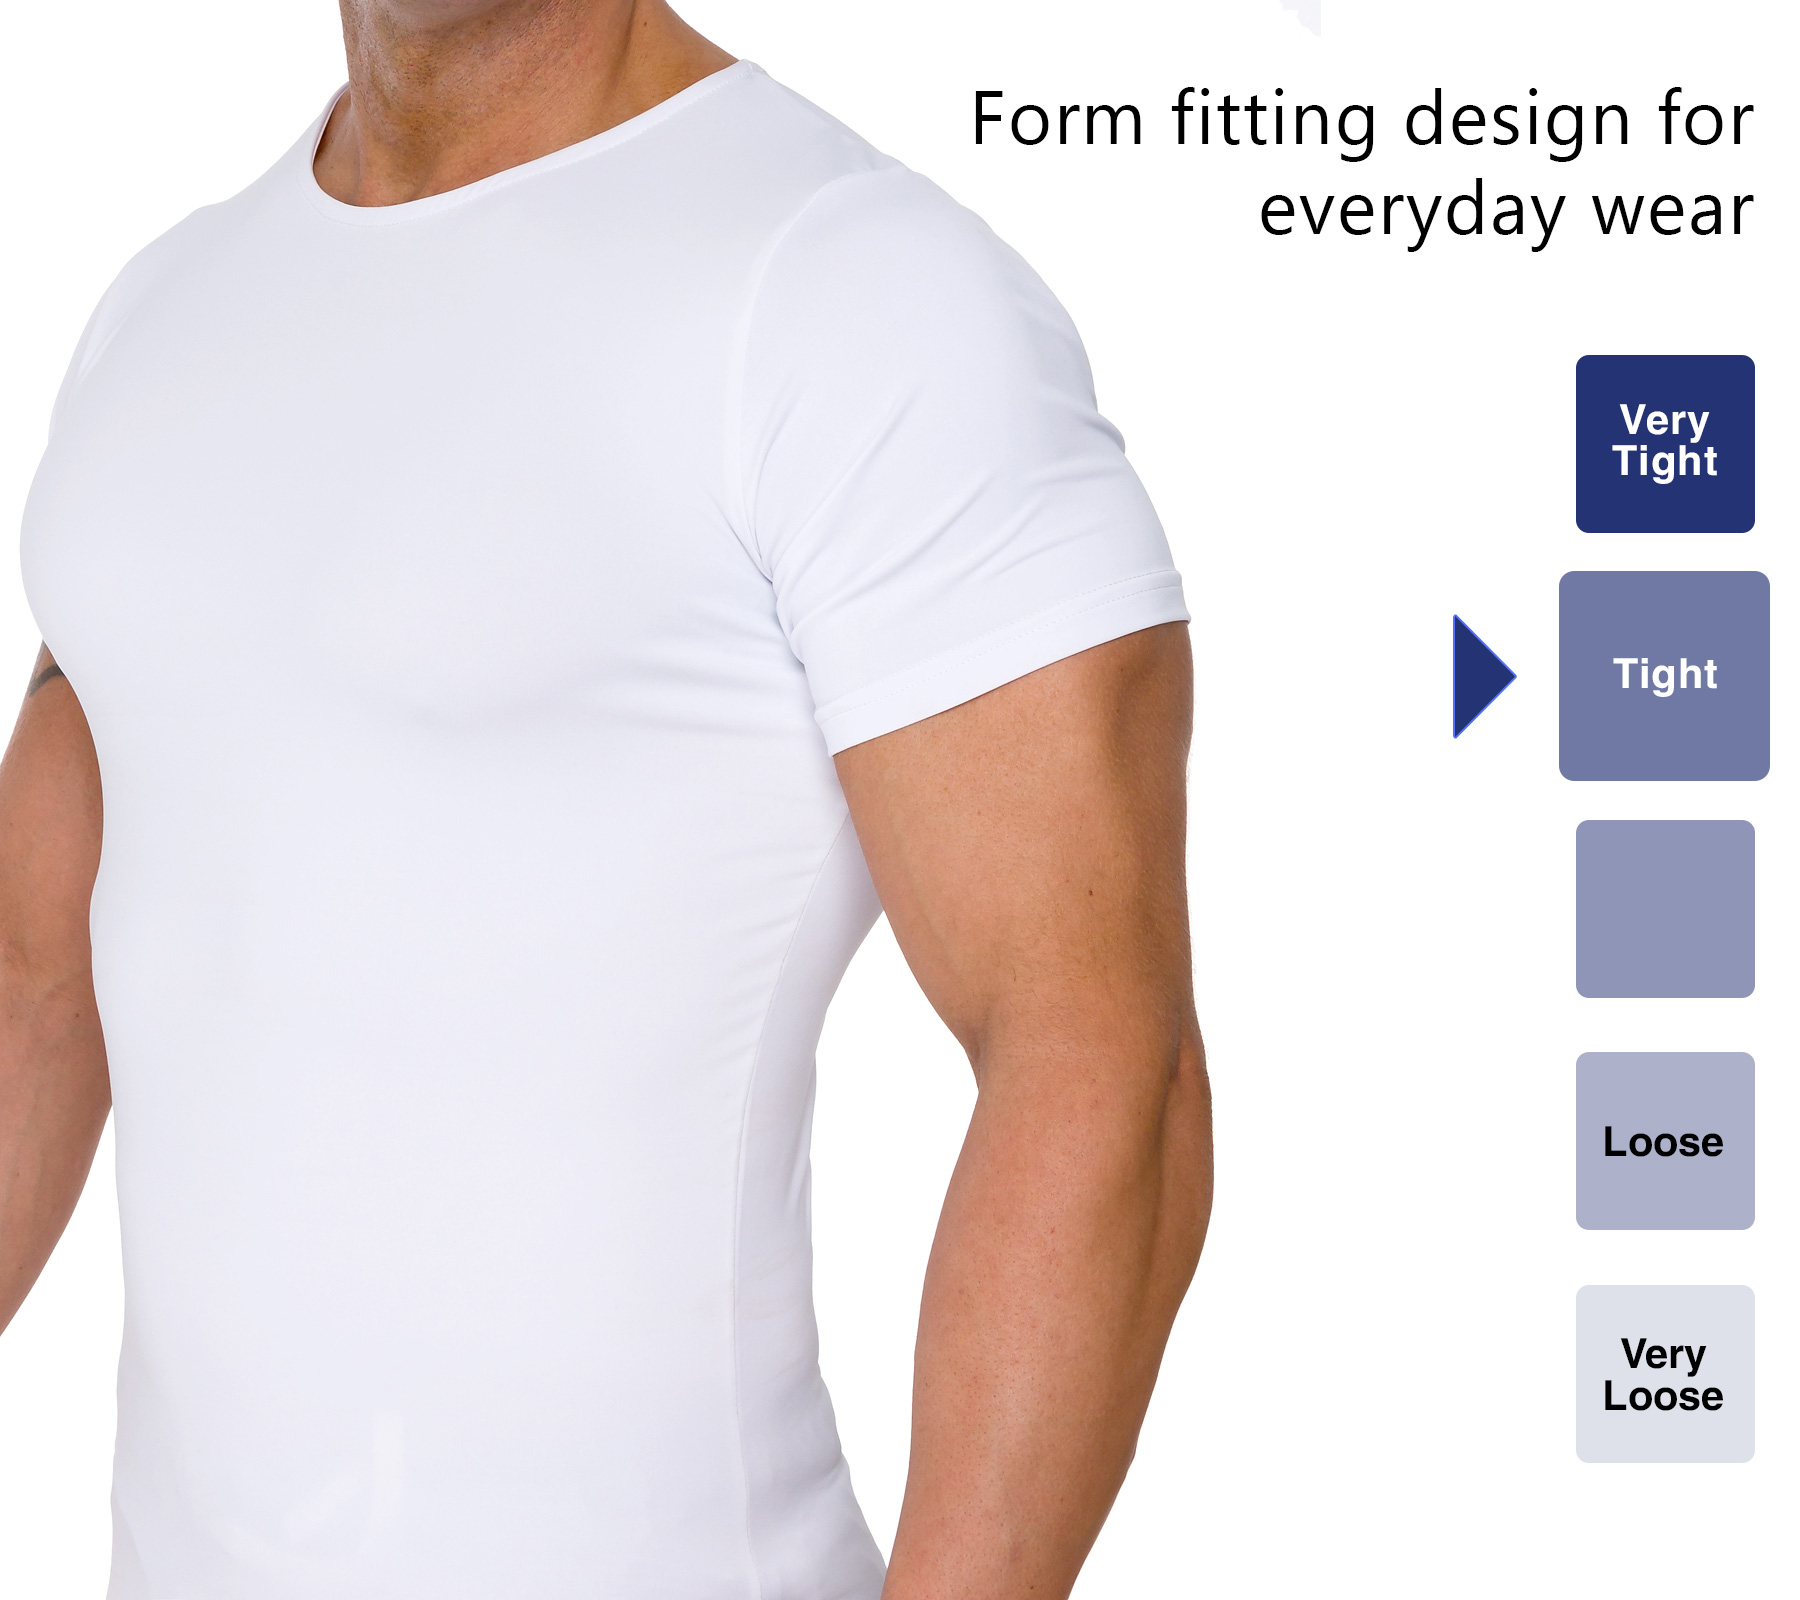 LISH-Men-039-s-Slimming-Compression-Body-Shaper-Gynecomastia-Undershirt thumbnail 23